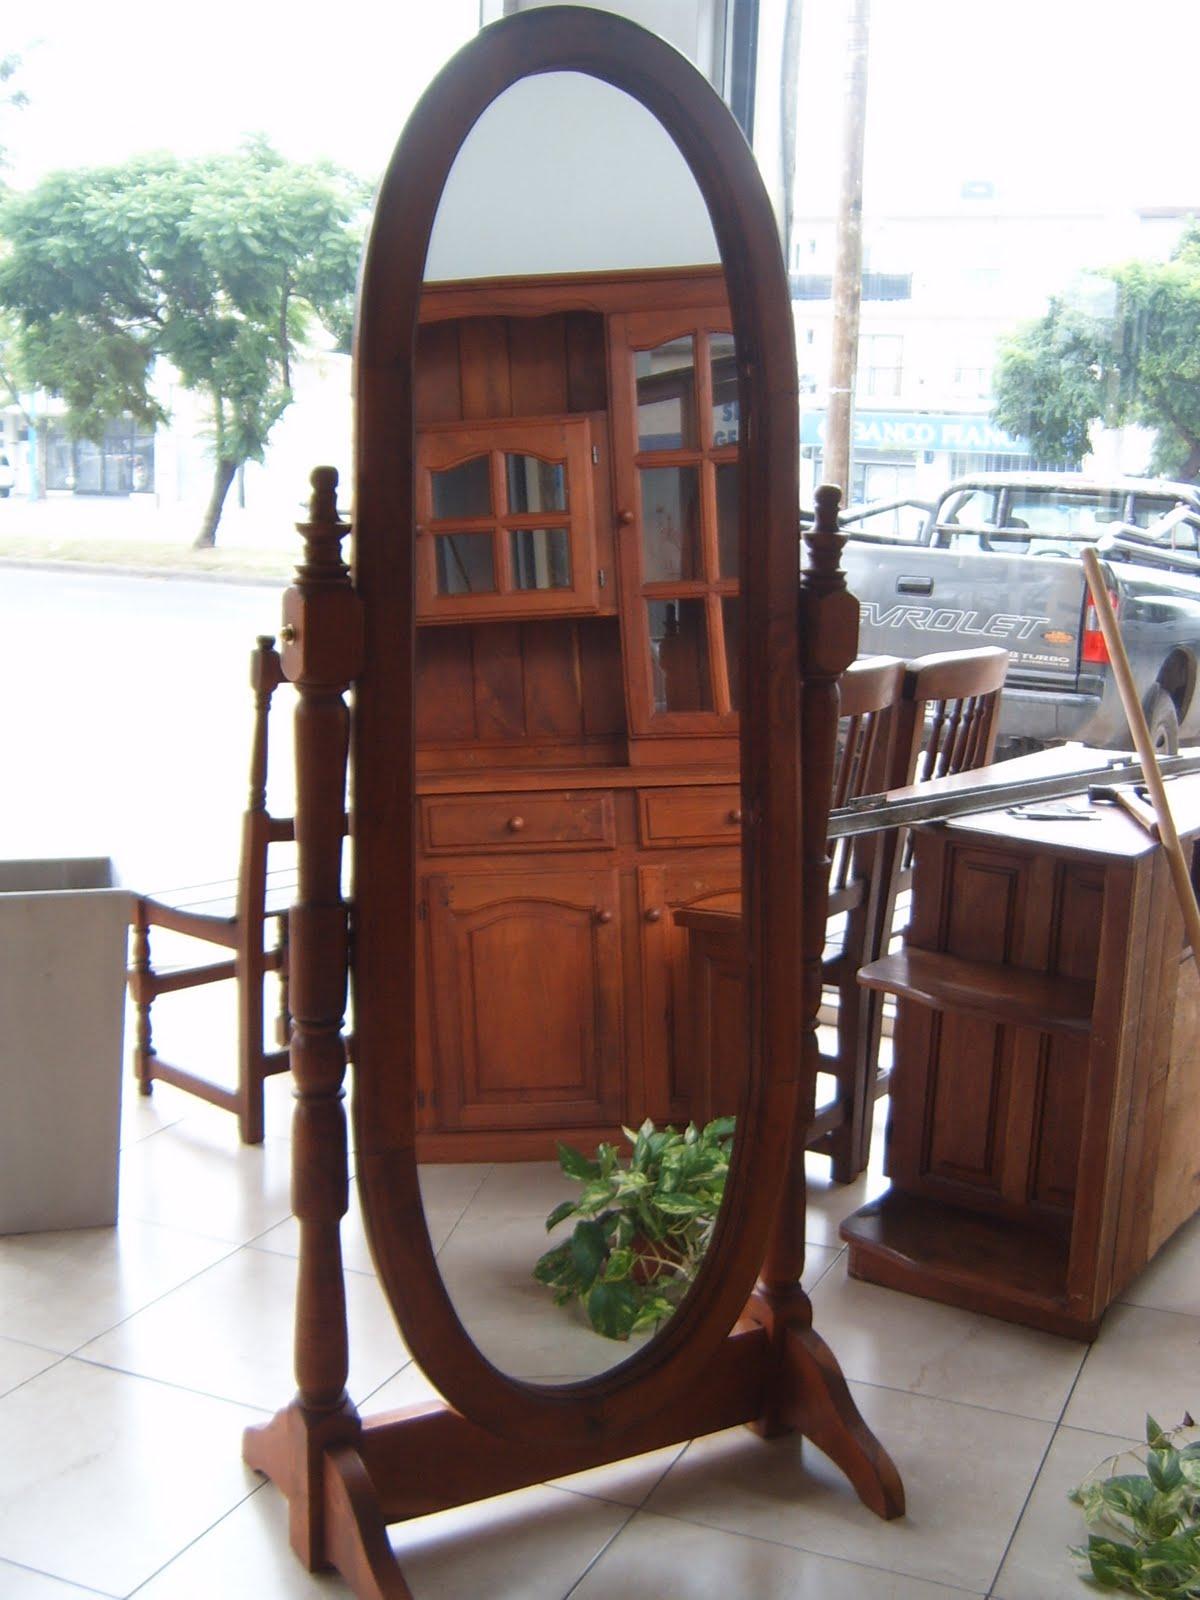 Mundoalgarrobo espejo de pie con el marco de algarrobo for Espejo ovalado de pie